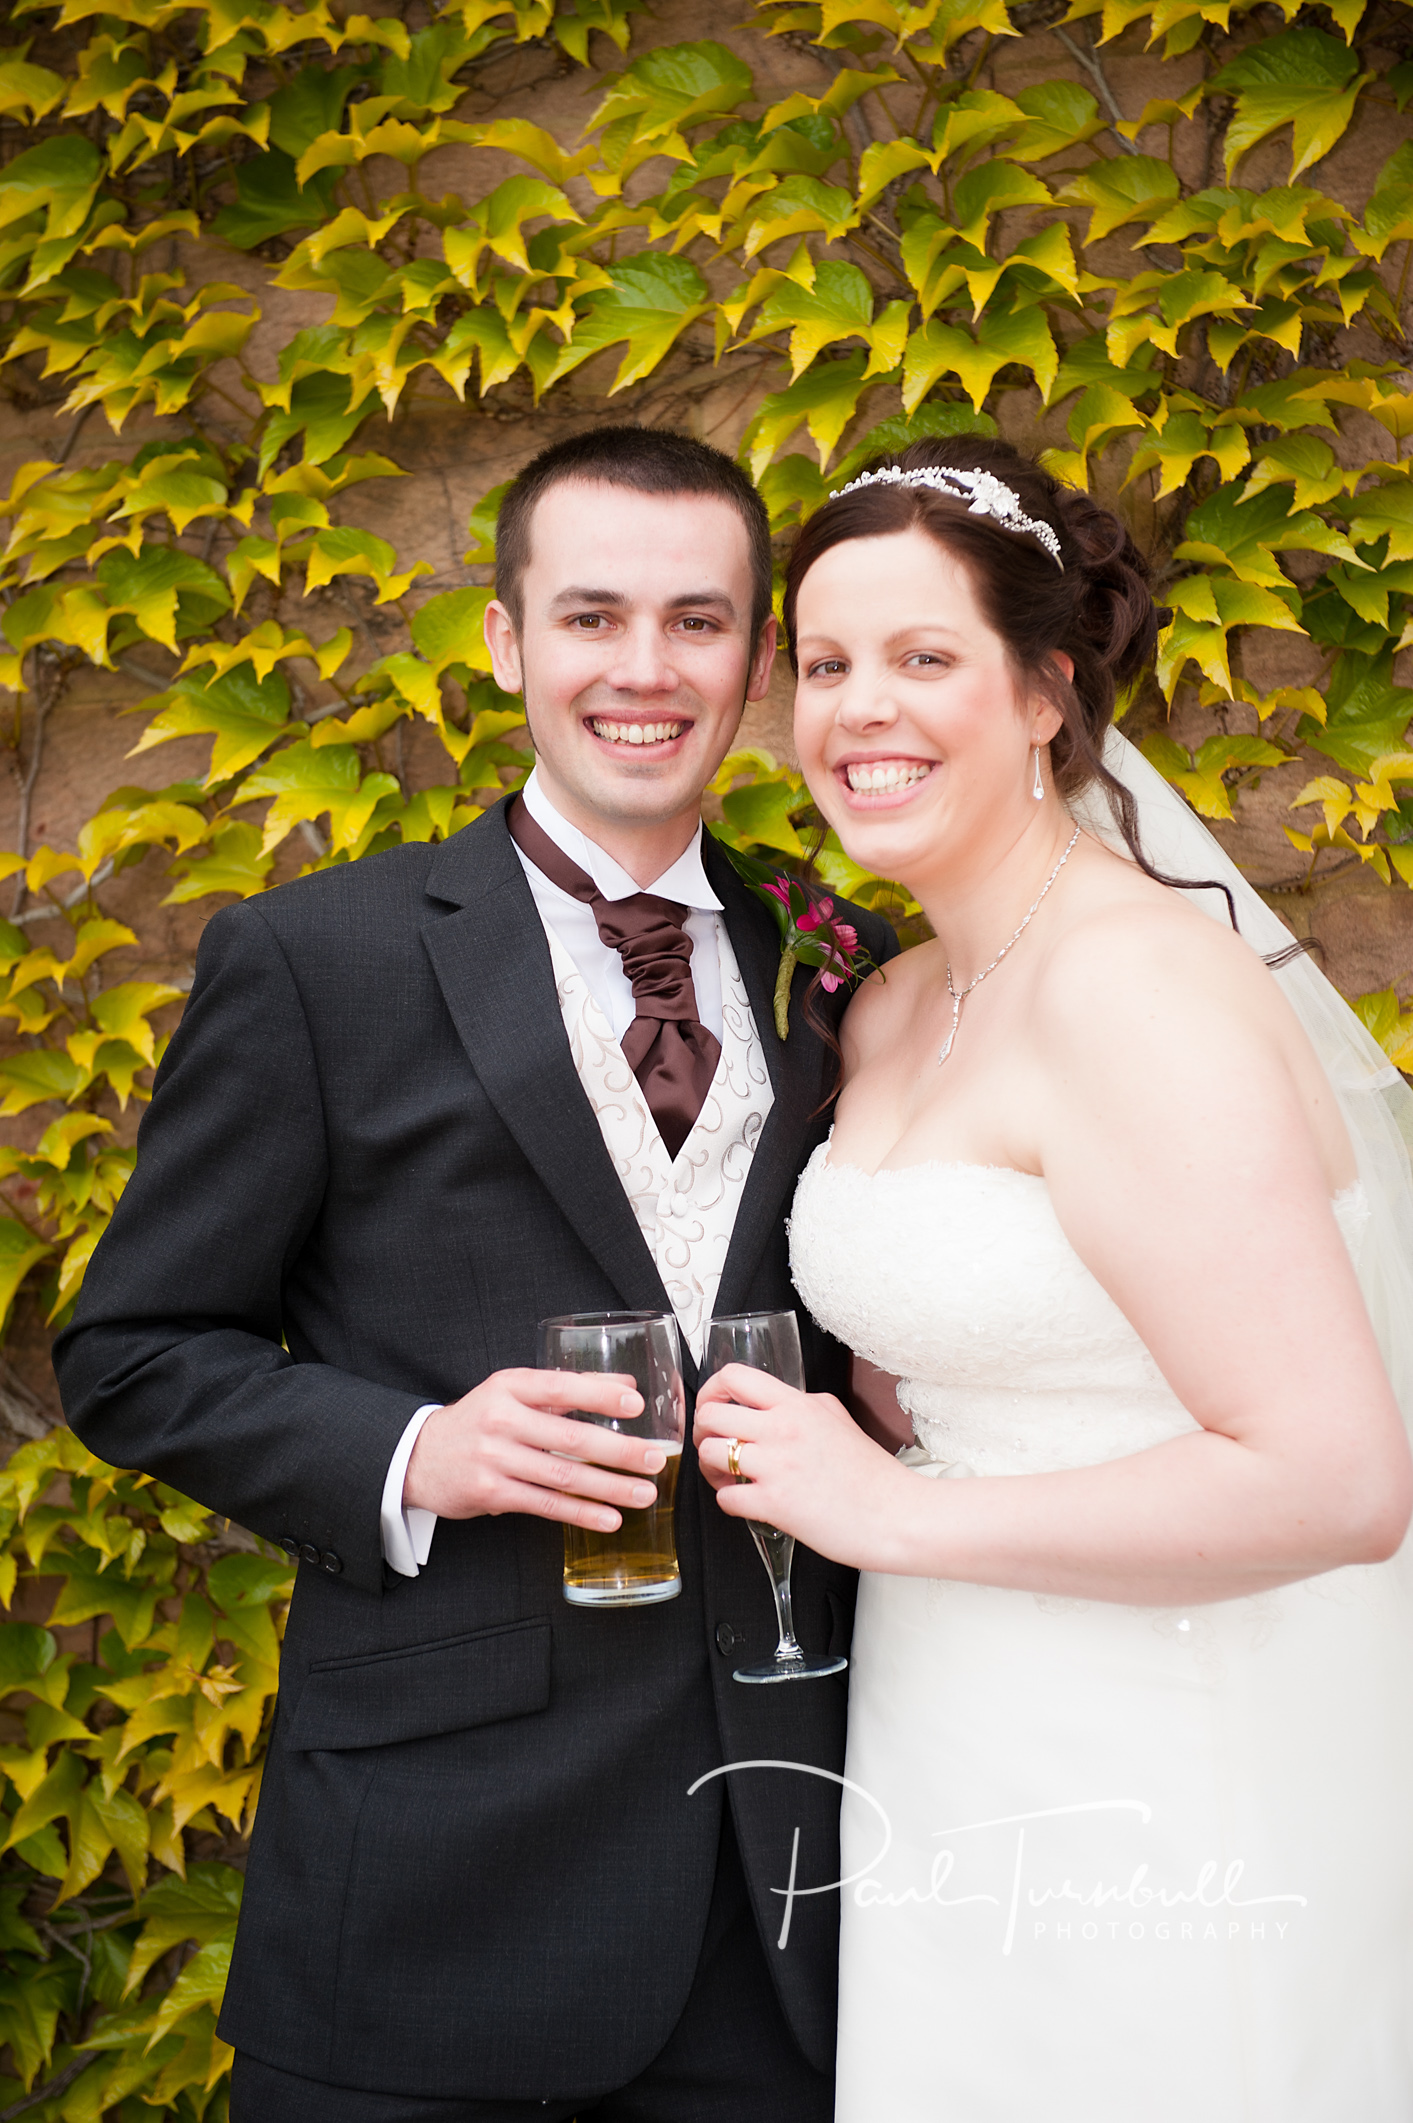 wedding-photography-wood-hall-wetherby-yorkshire-046.jpg